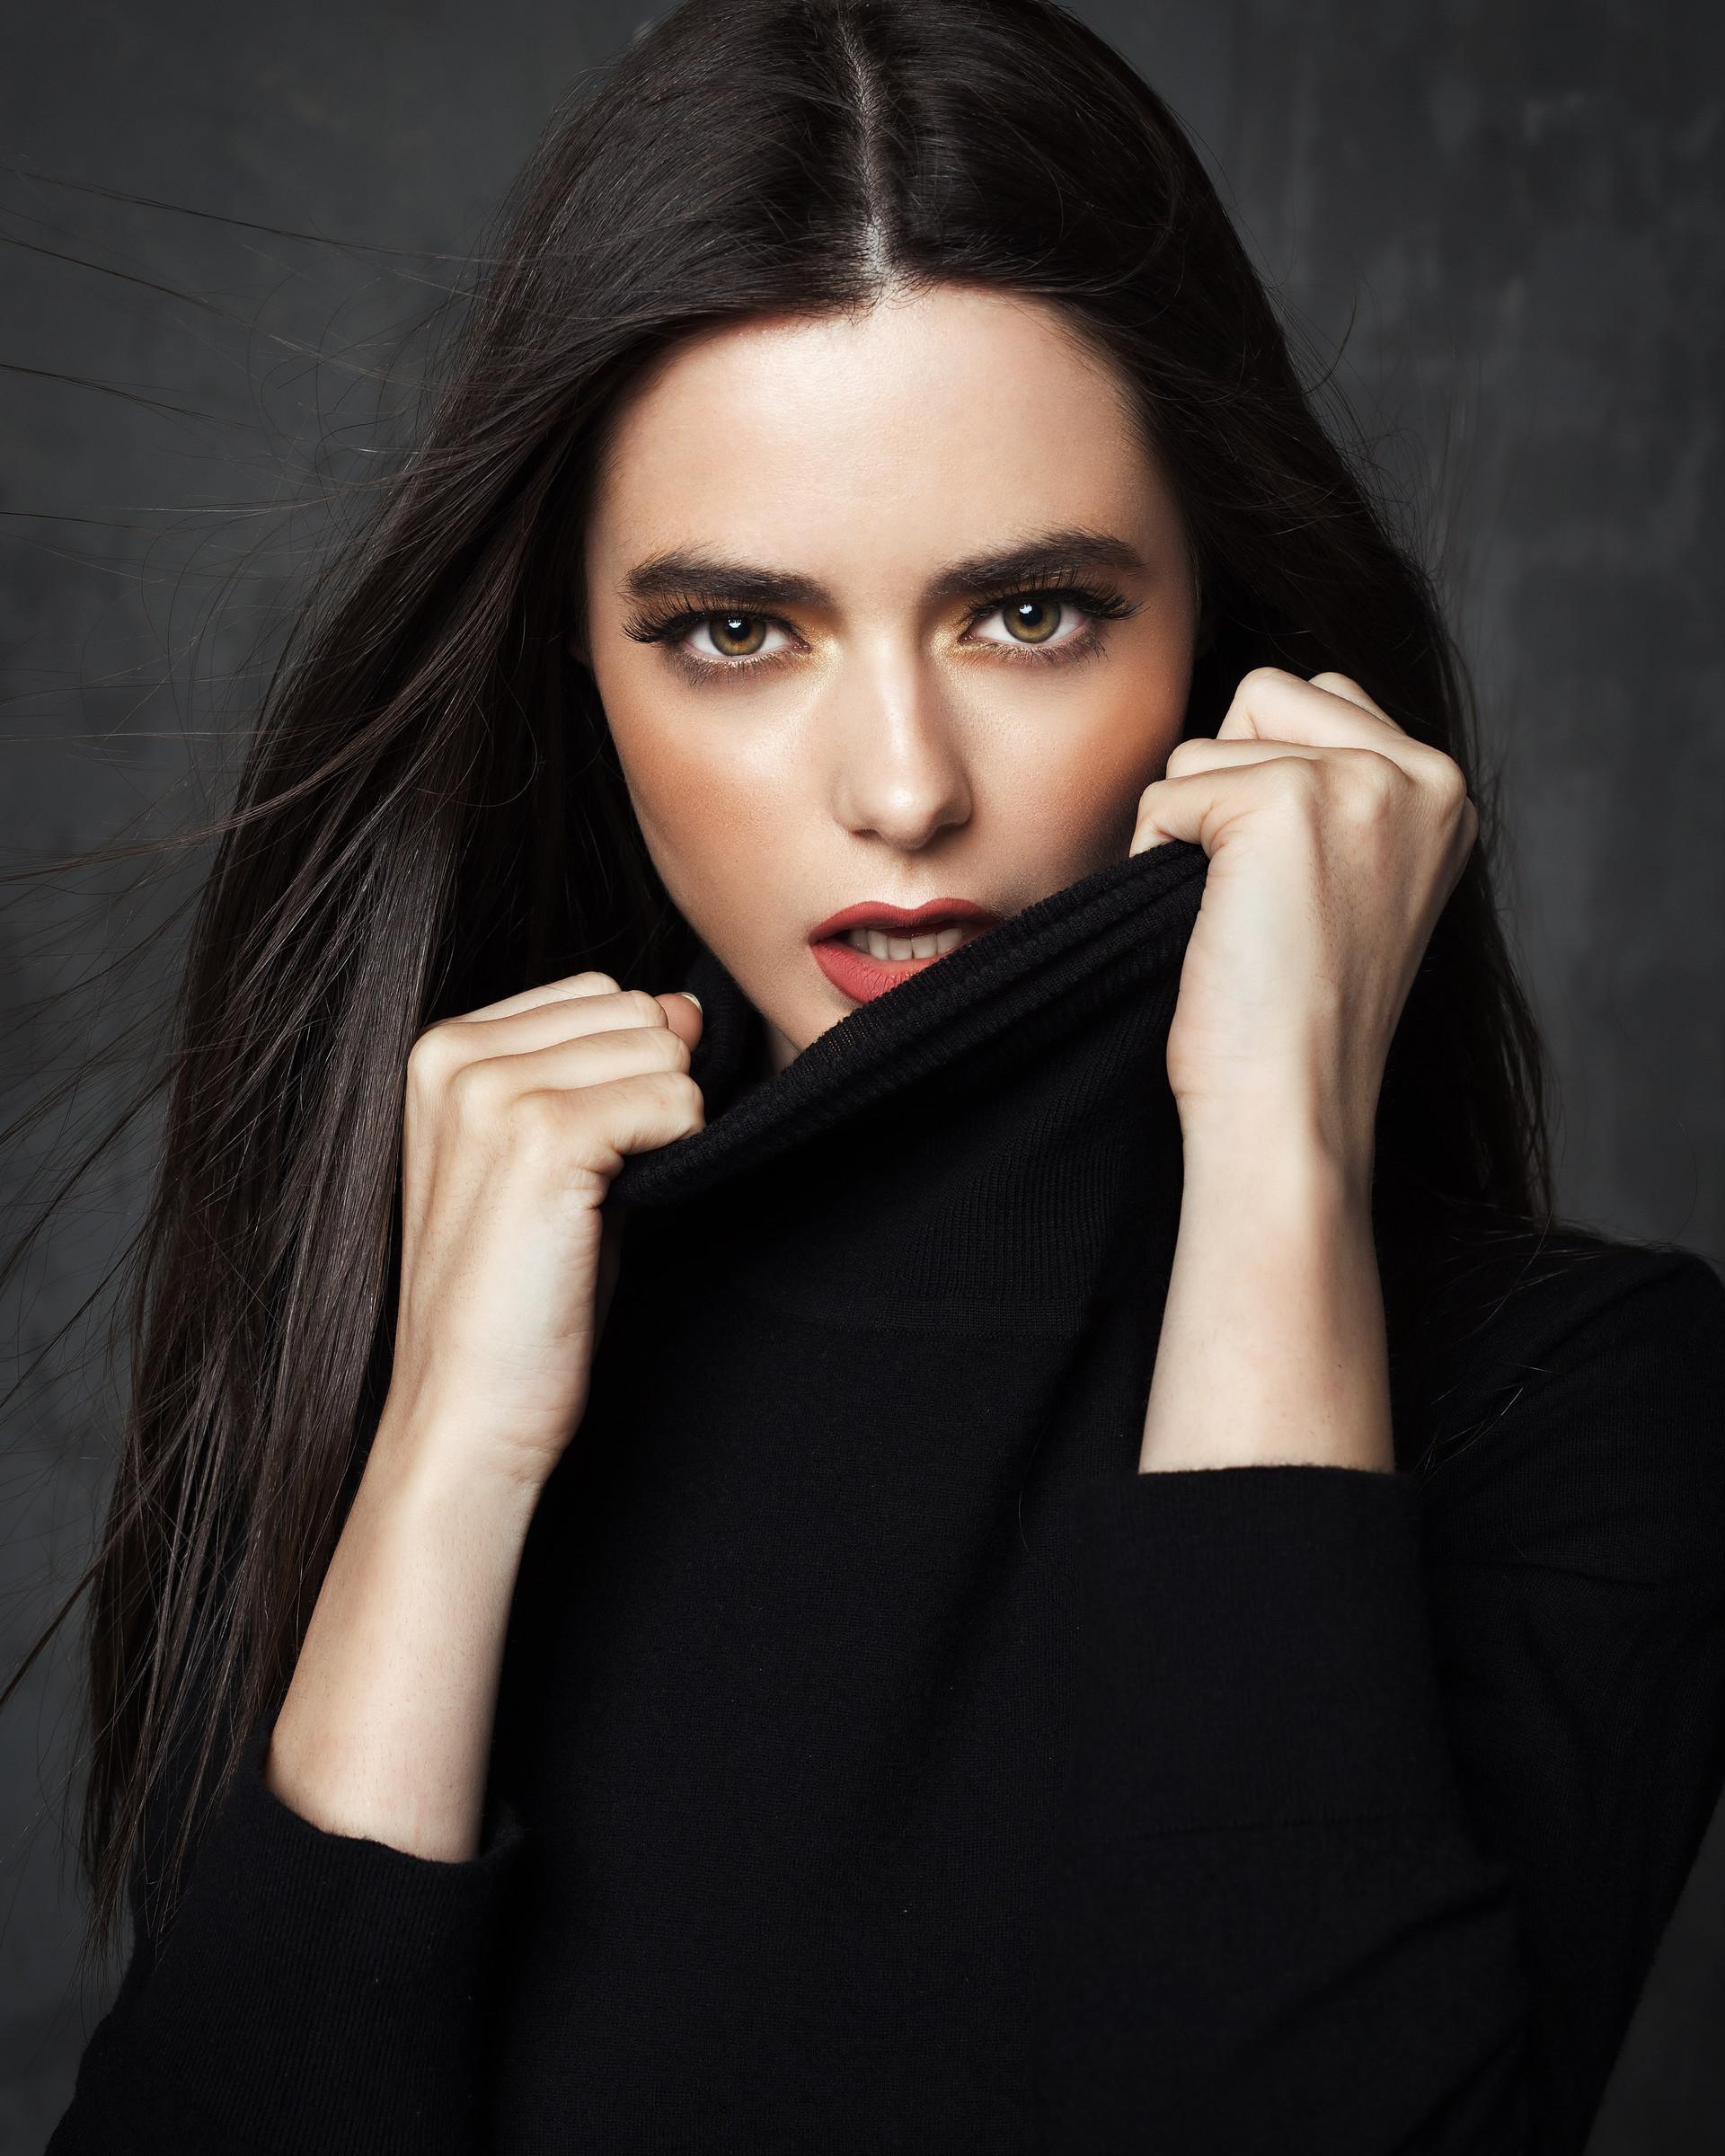 Photographer: Dookie Ducay Stylist: Jebby Fronda Hairstylist: Raven Dizon of Jing Monis Model: Bronija Ales For BYS Cosmetics